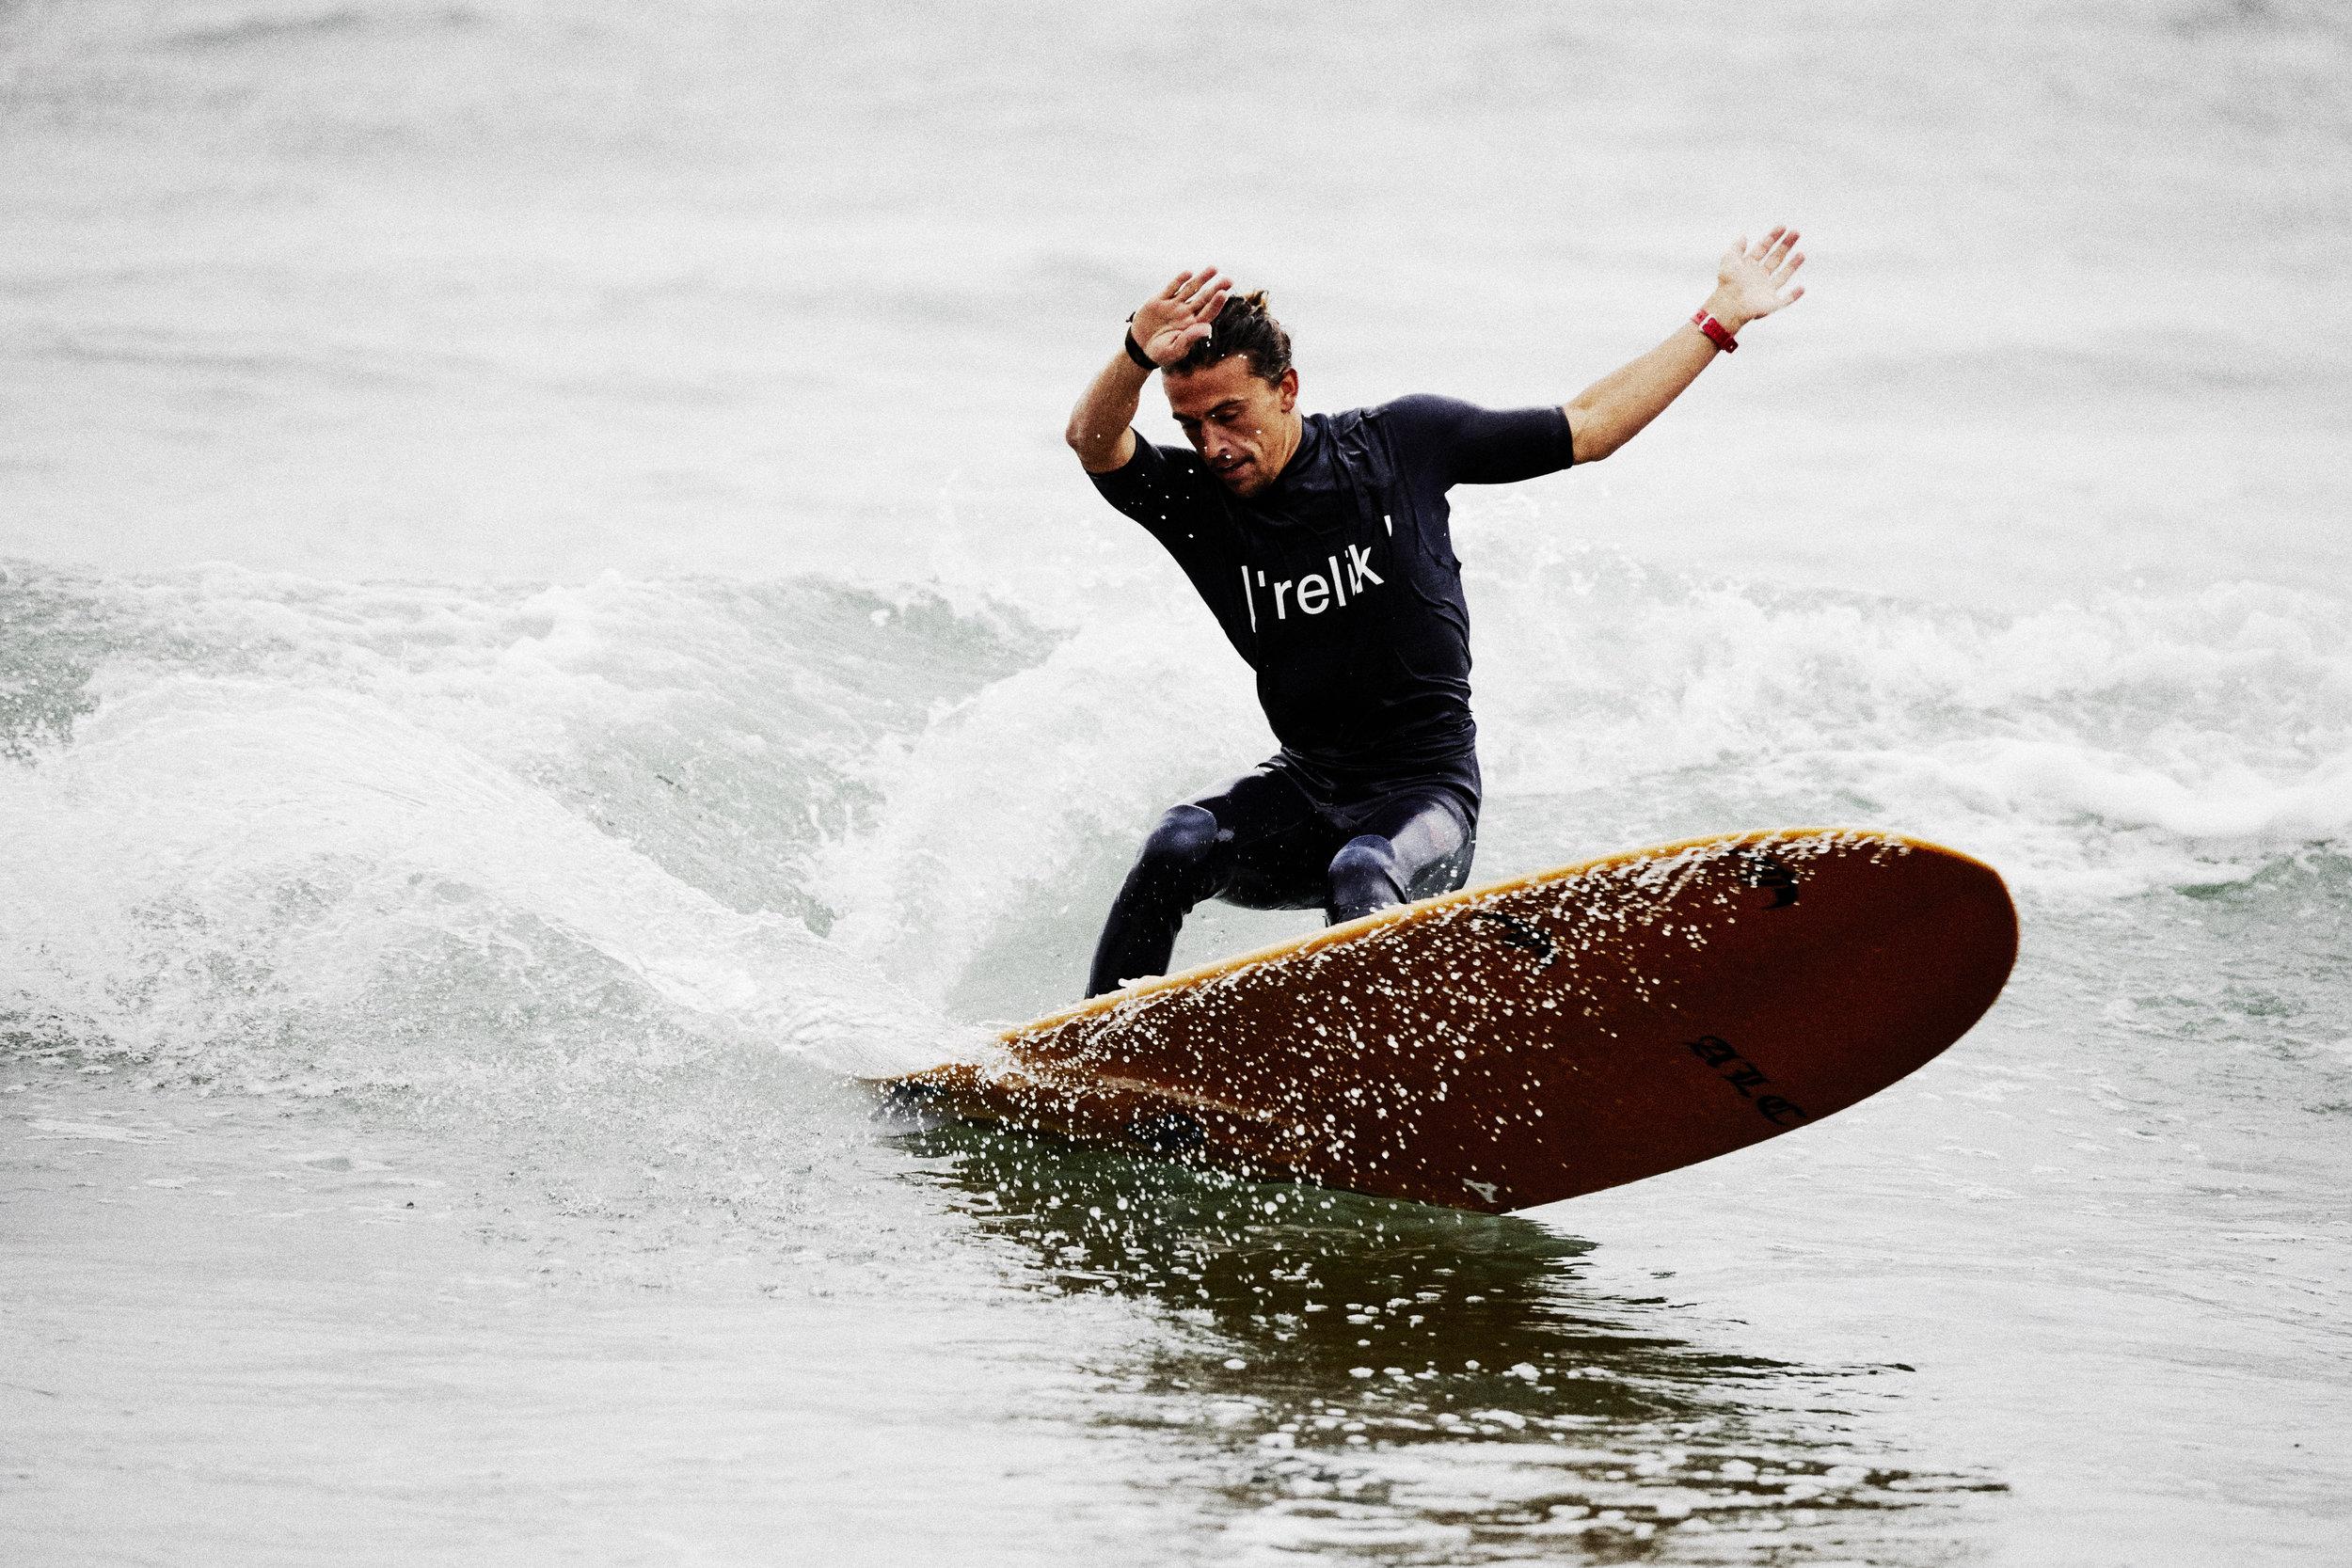 Surf_Relic_Malibu_457.jpg